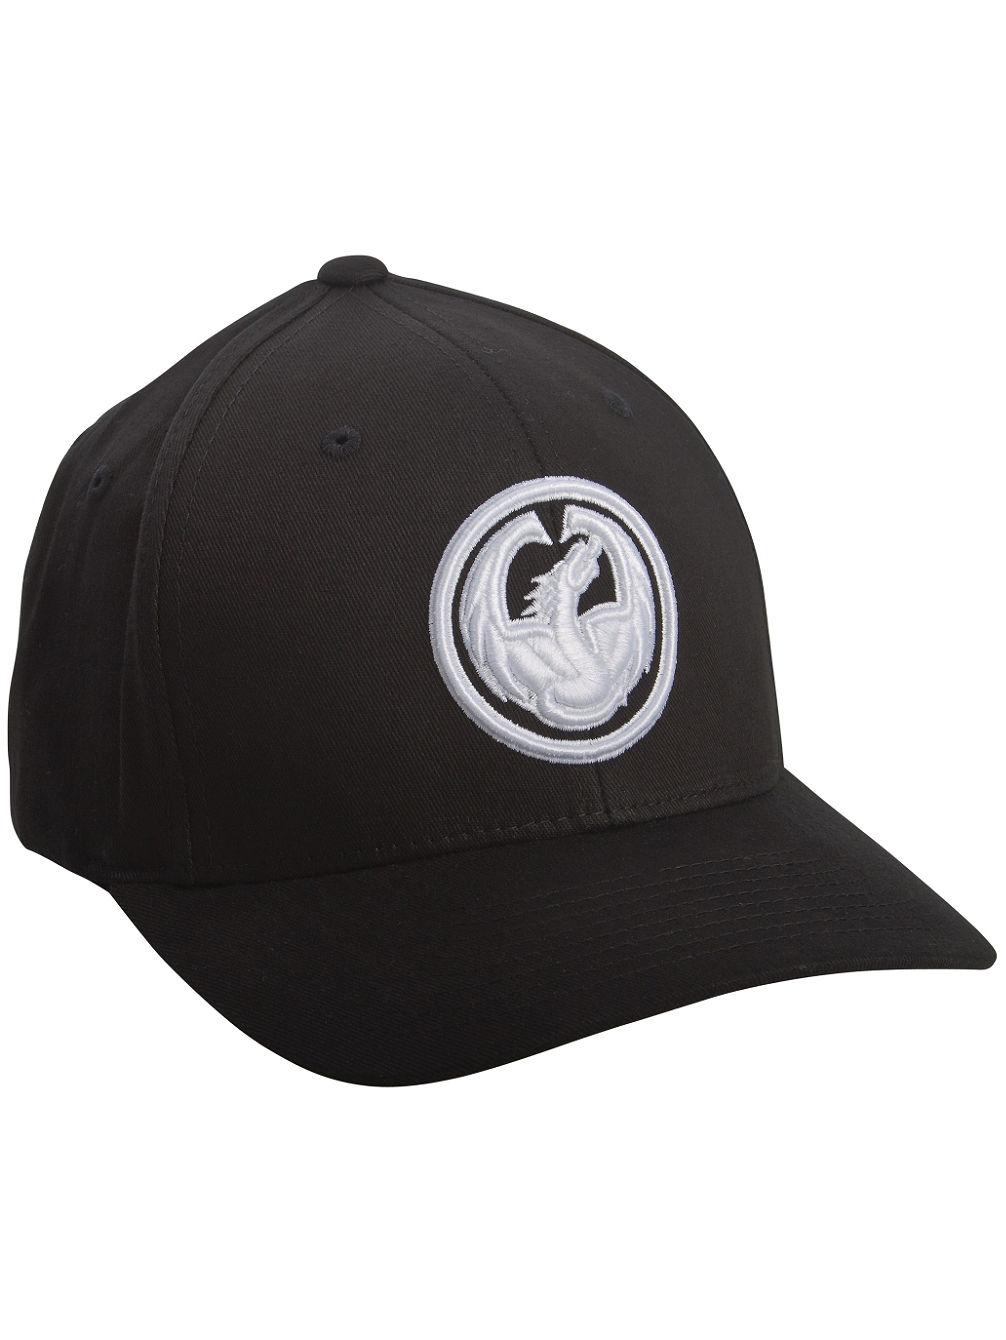 dragon-corp-flex-staple-line-cap